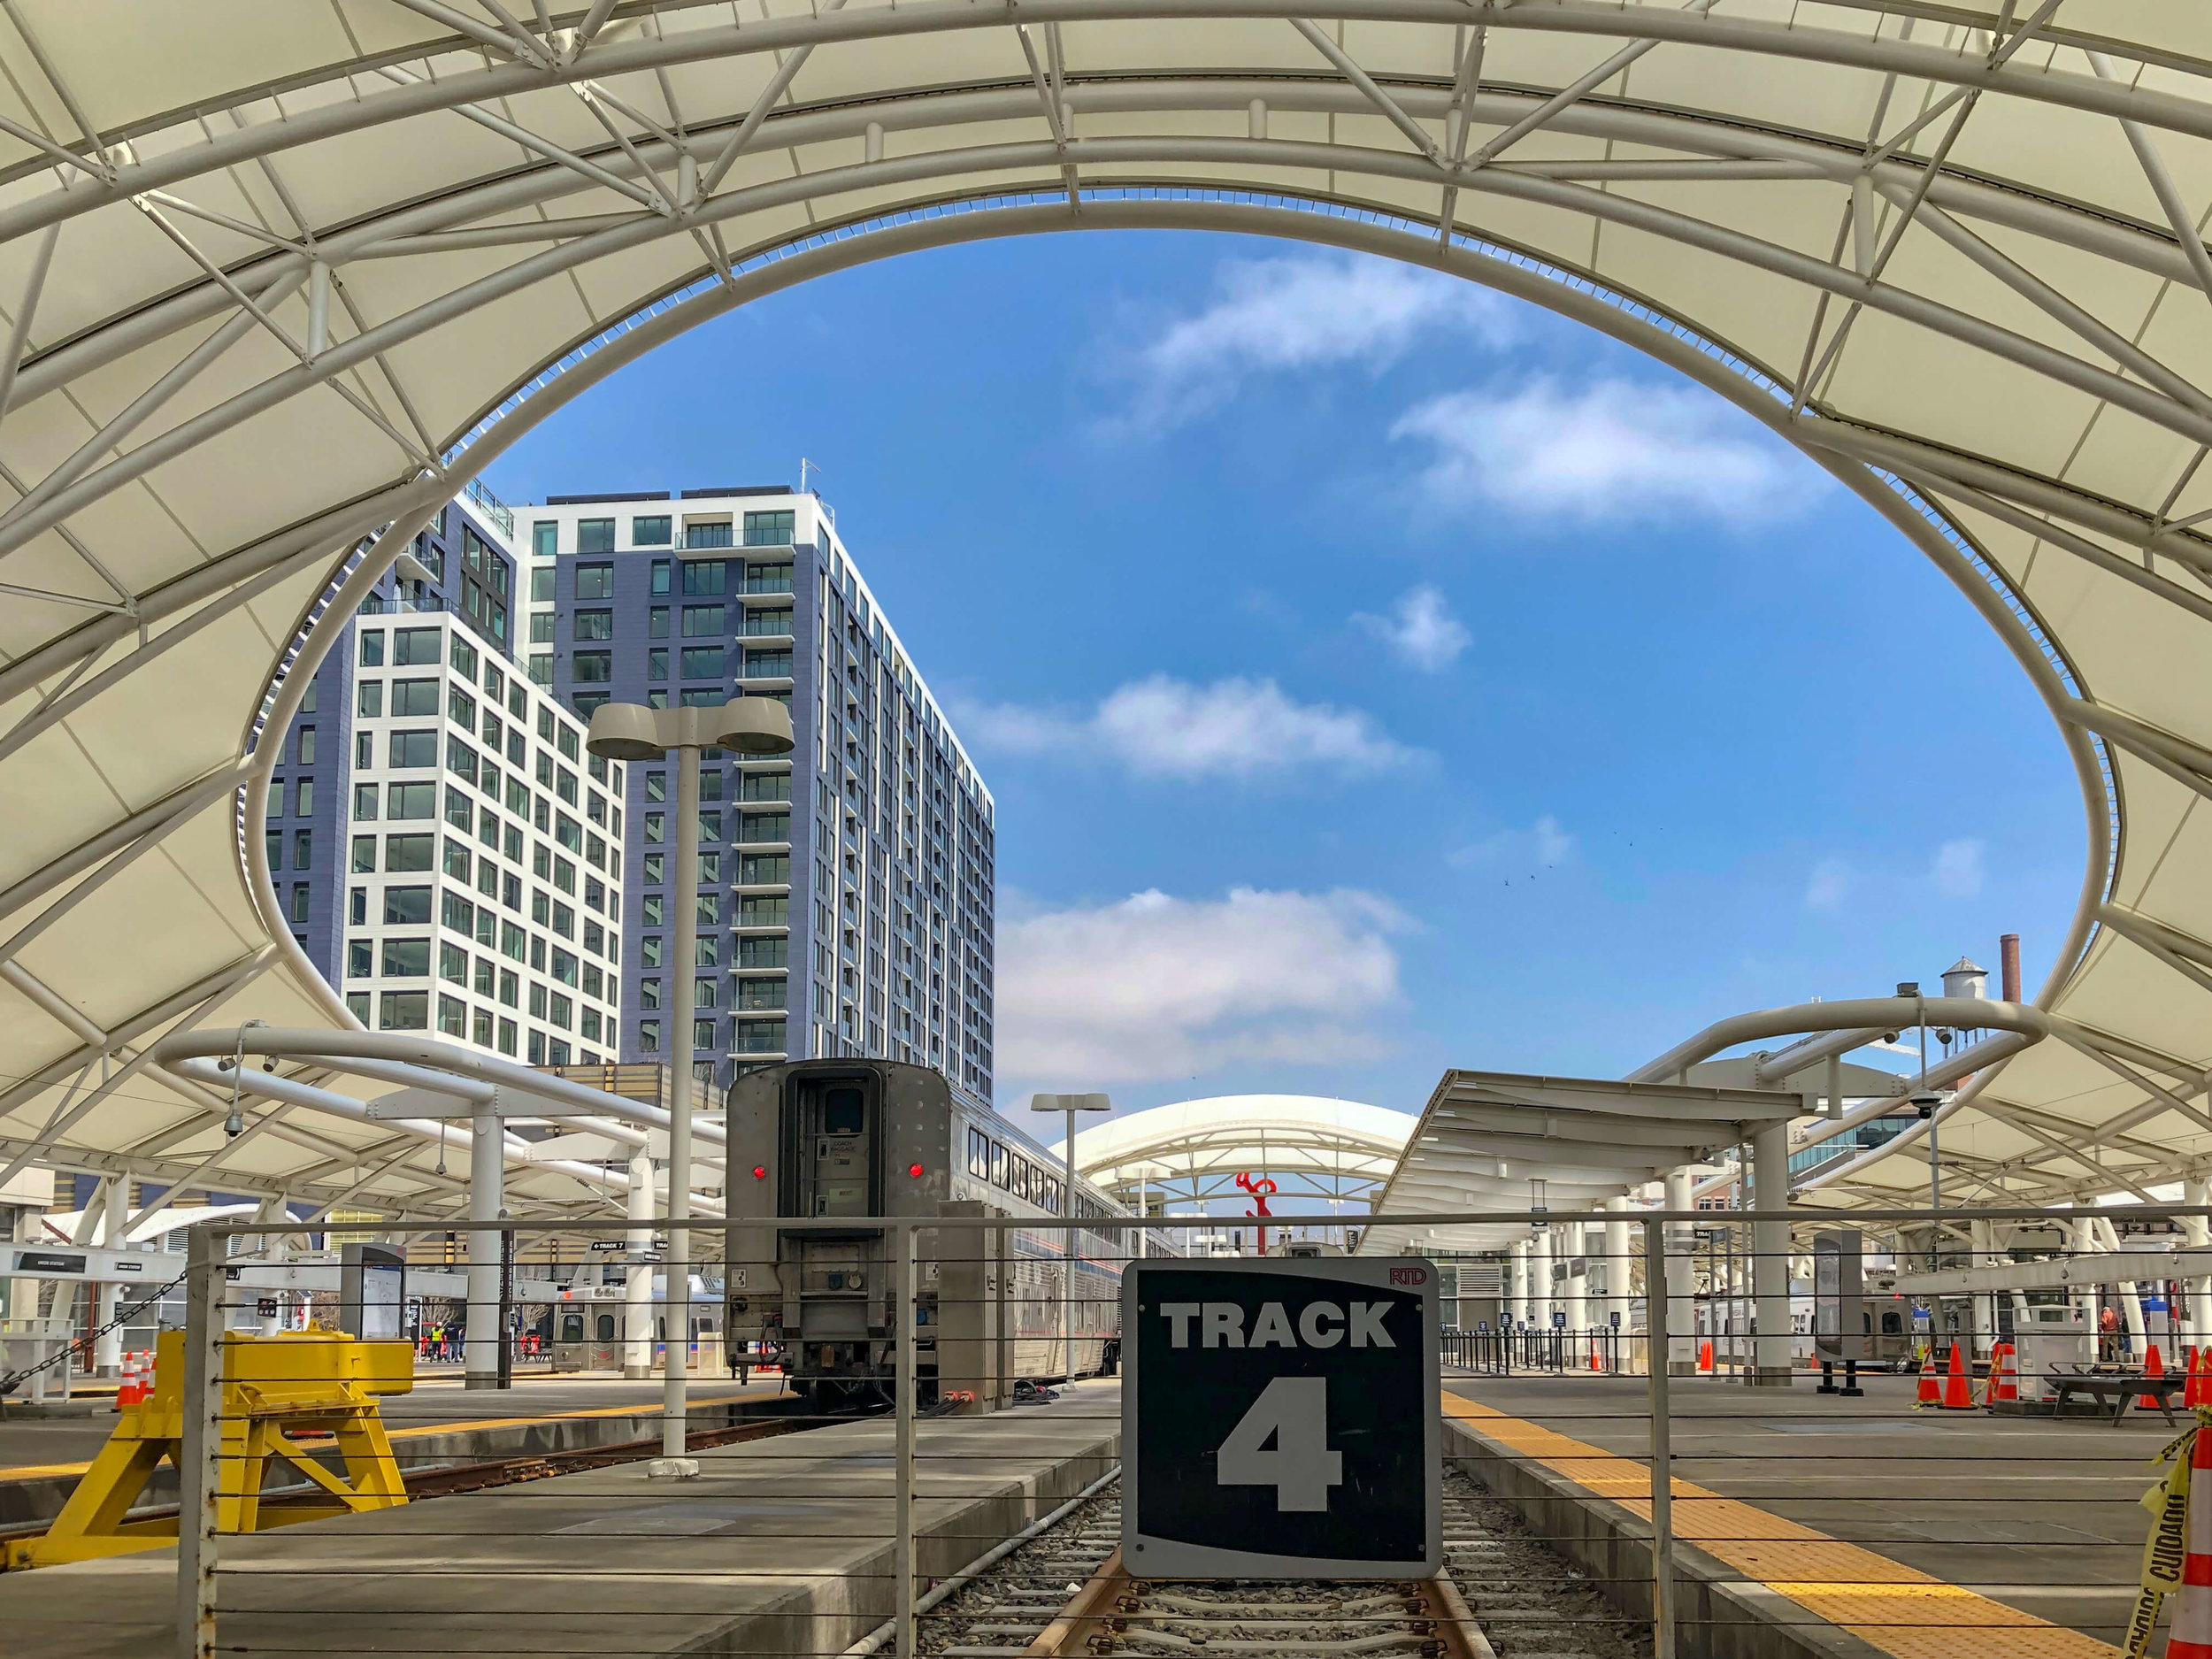 Train Tracks Union Station.jpg